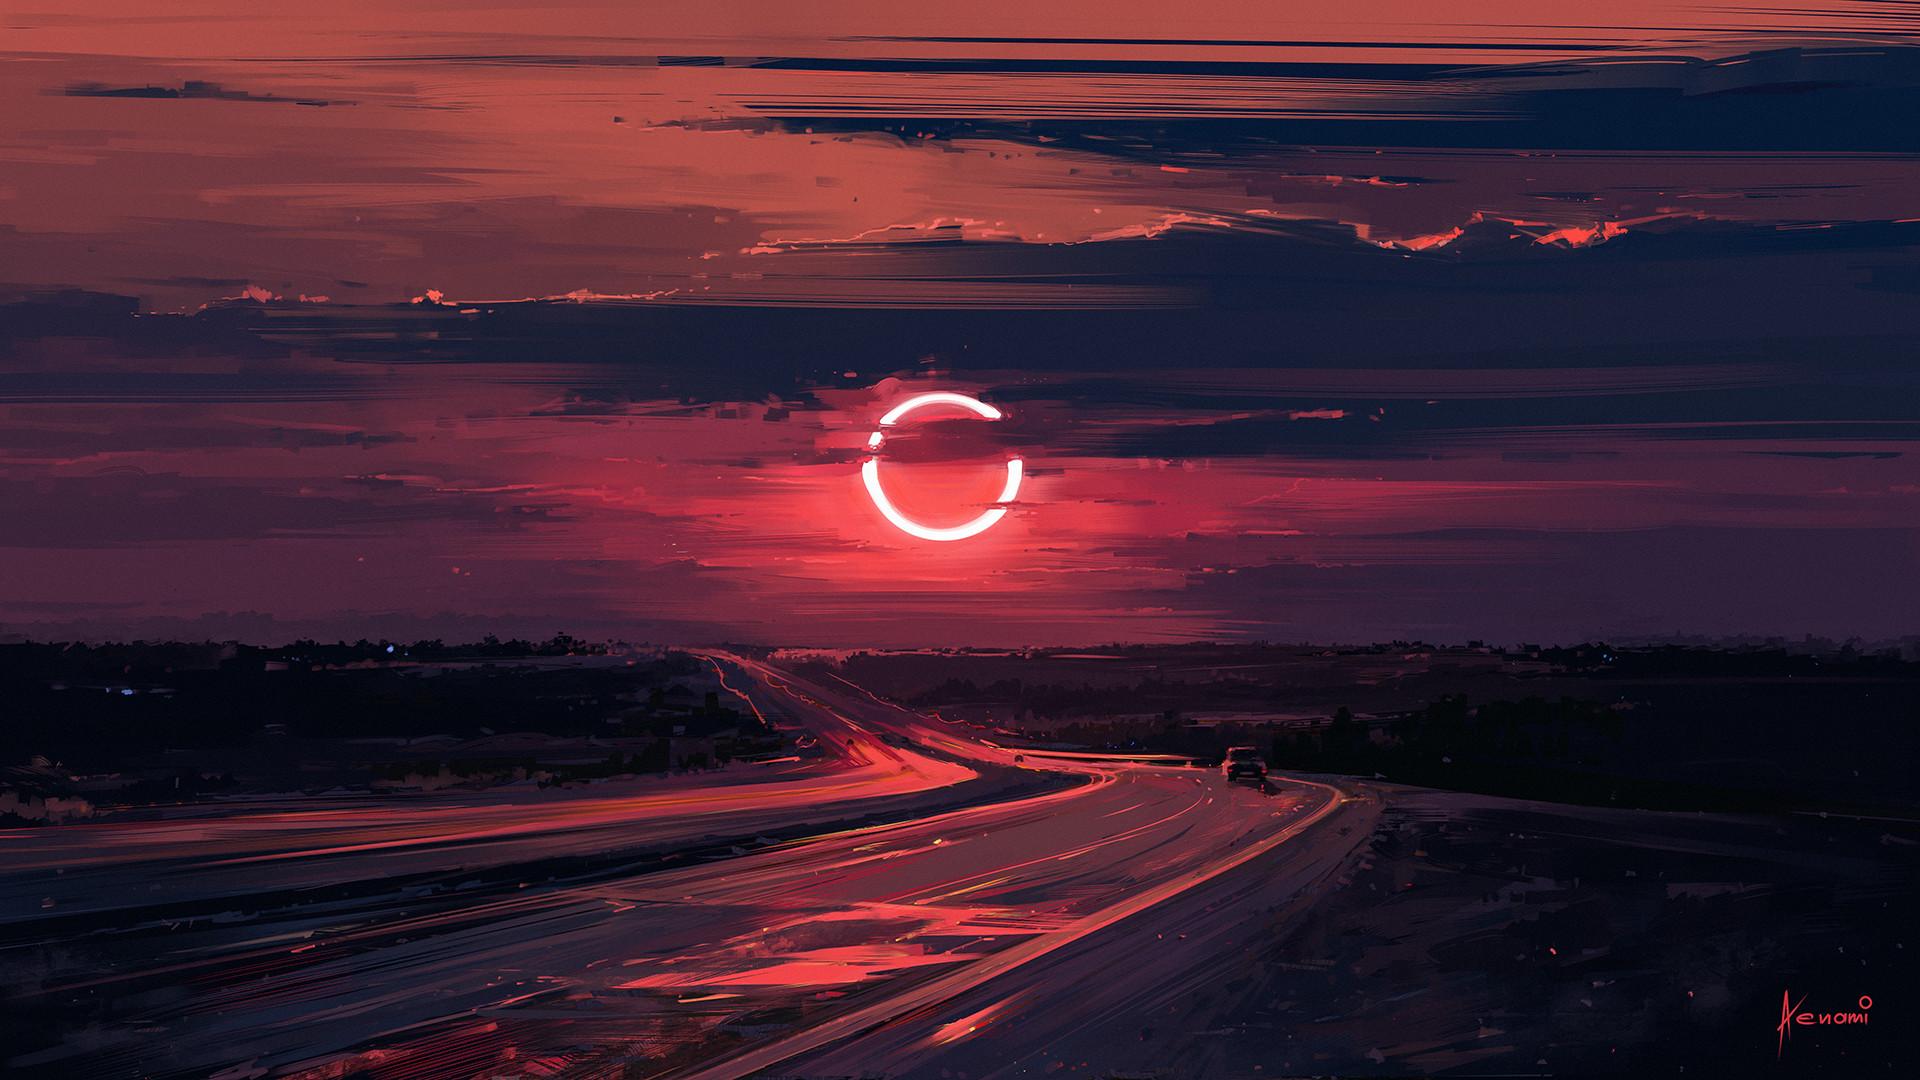 Carbon Wallpaper Iphone X Artstation Eclipse Alena Aenami